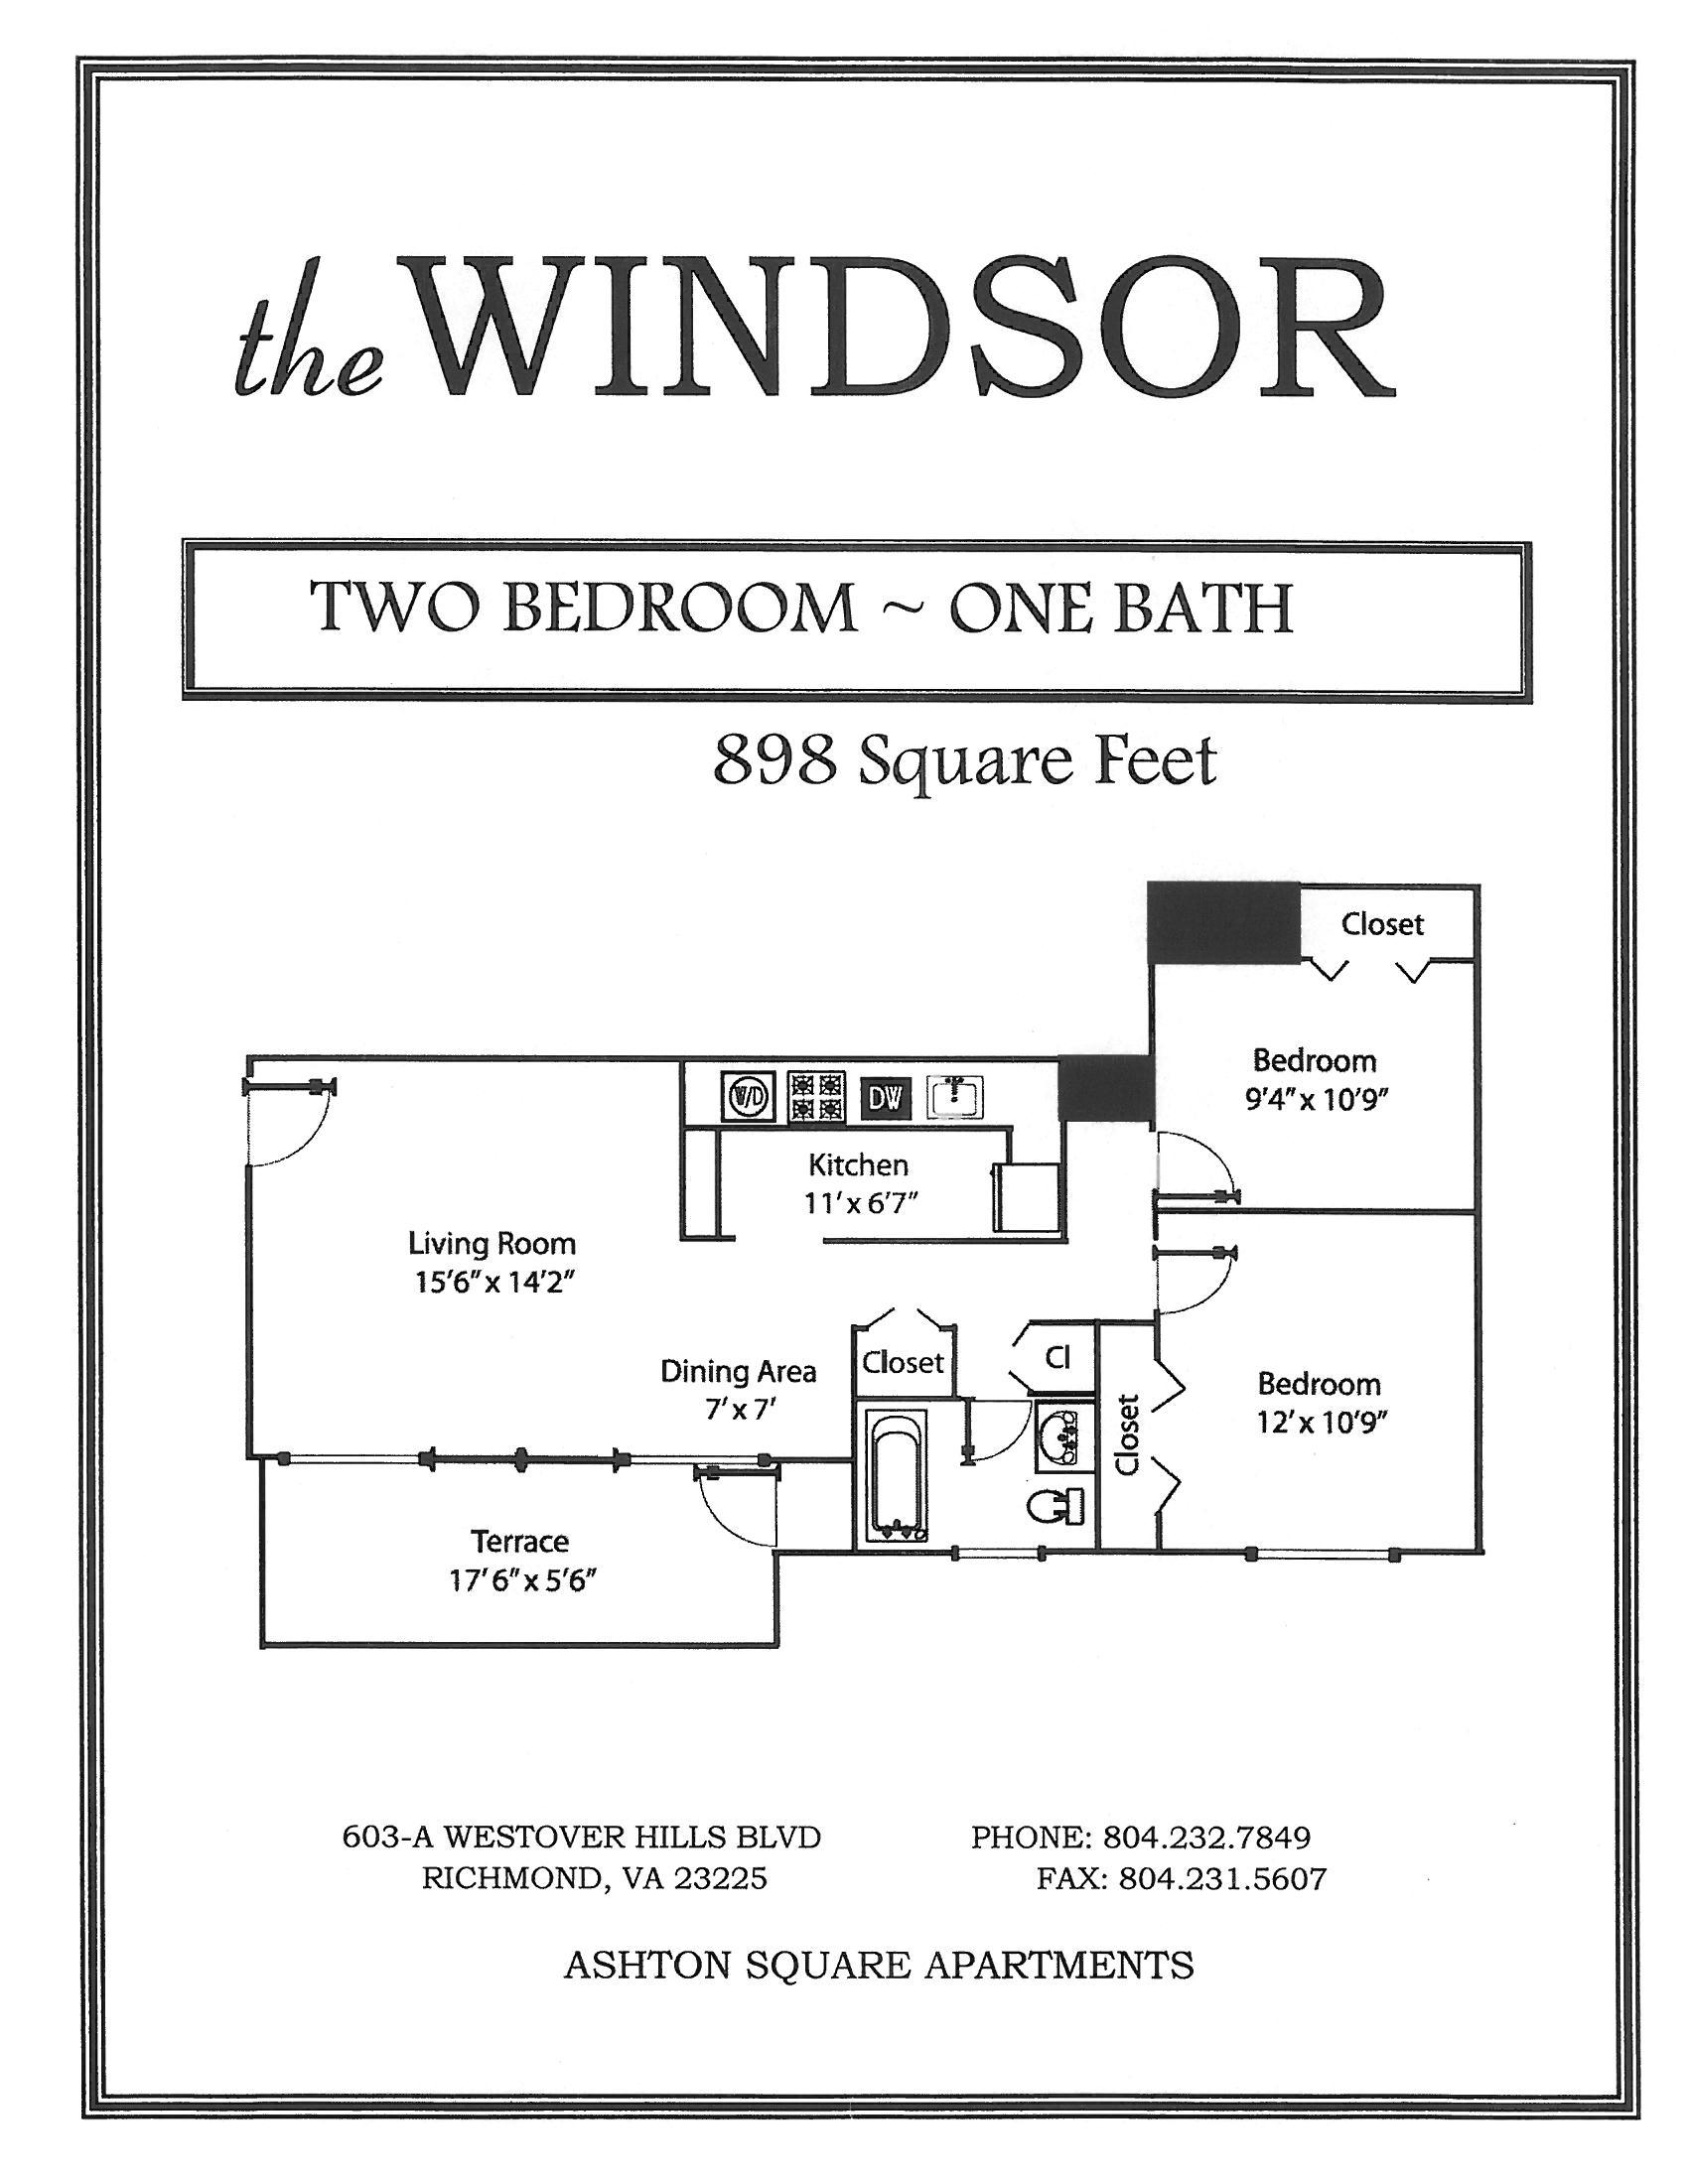 2 Bedroom 1 Bathroom Floor Plan at Ashton Square Apartments